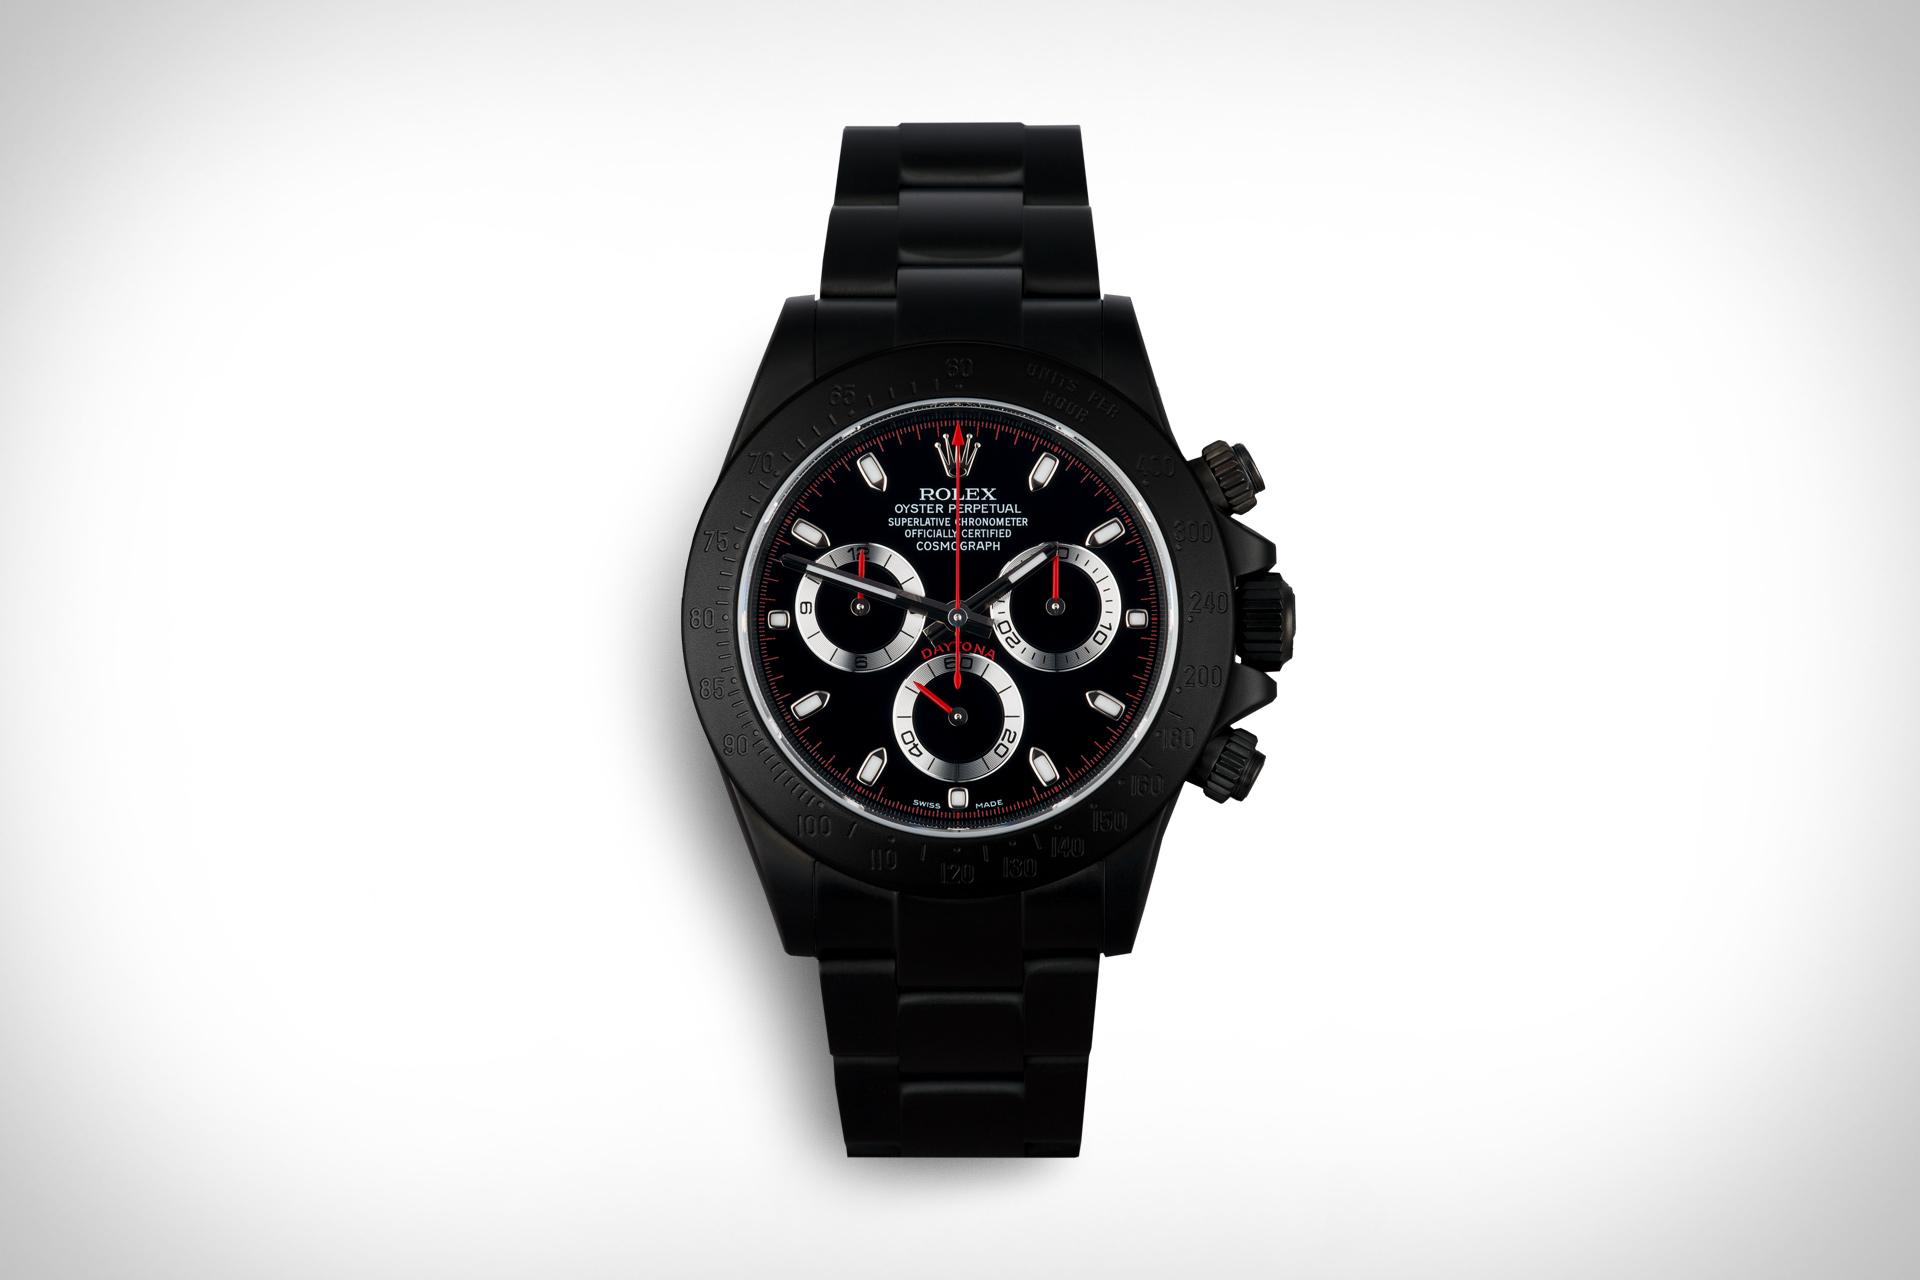 Pro Hunter Rolex Daytona Stealth Watch